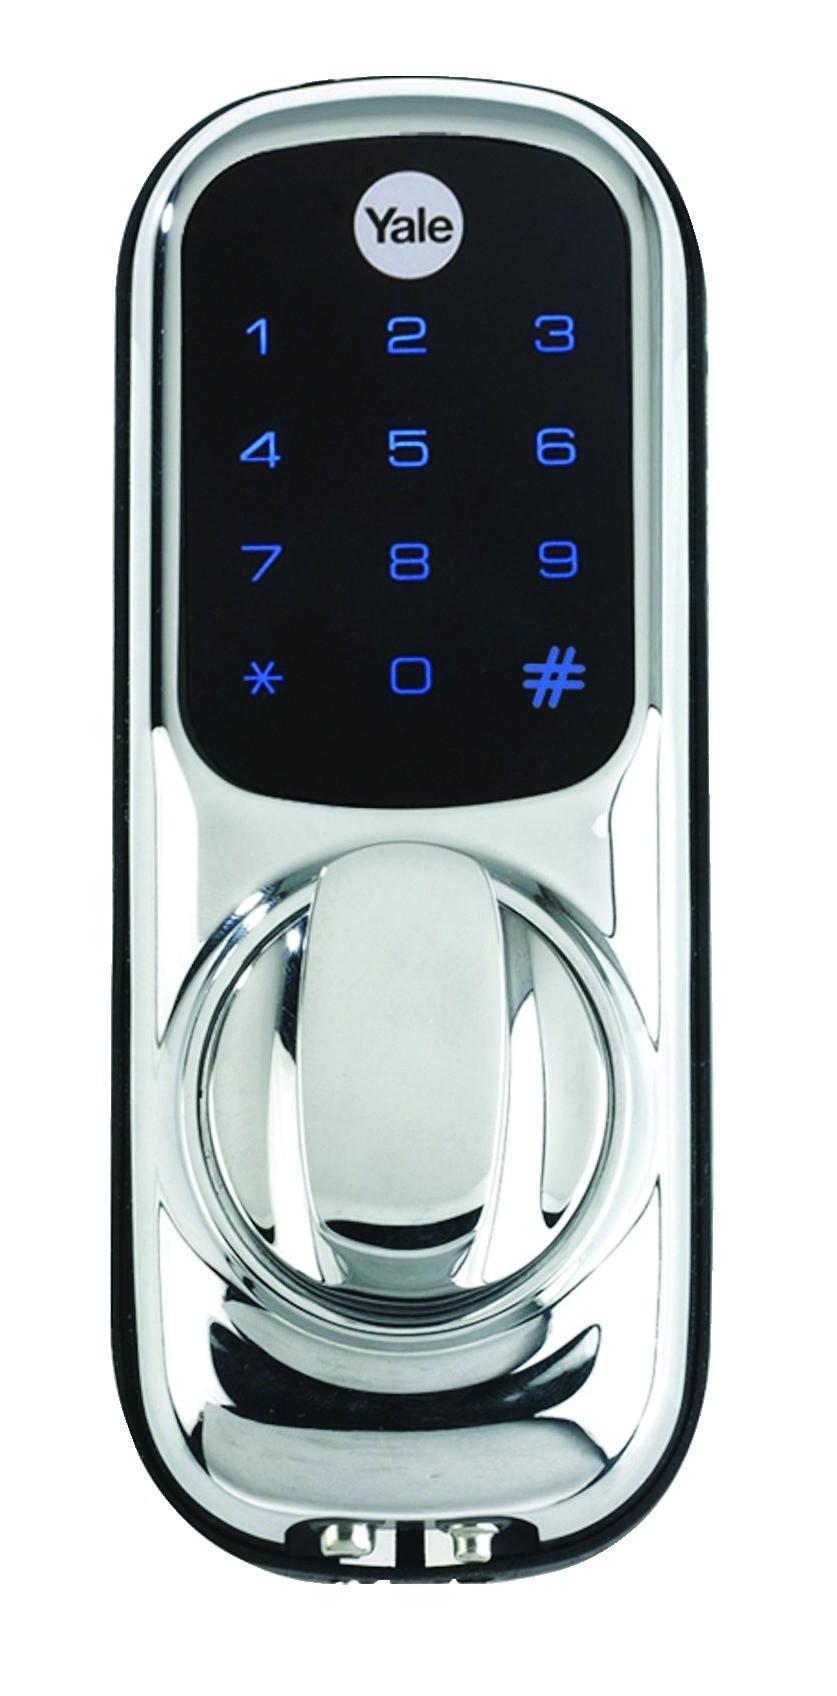 yale keyless digital door lock with nightlatch touch. Black Bedroom Furniture Sets. Home Design Ideas